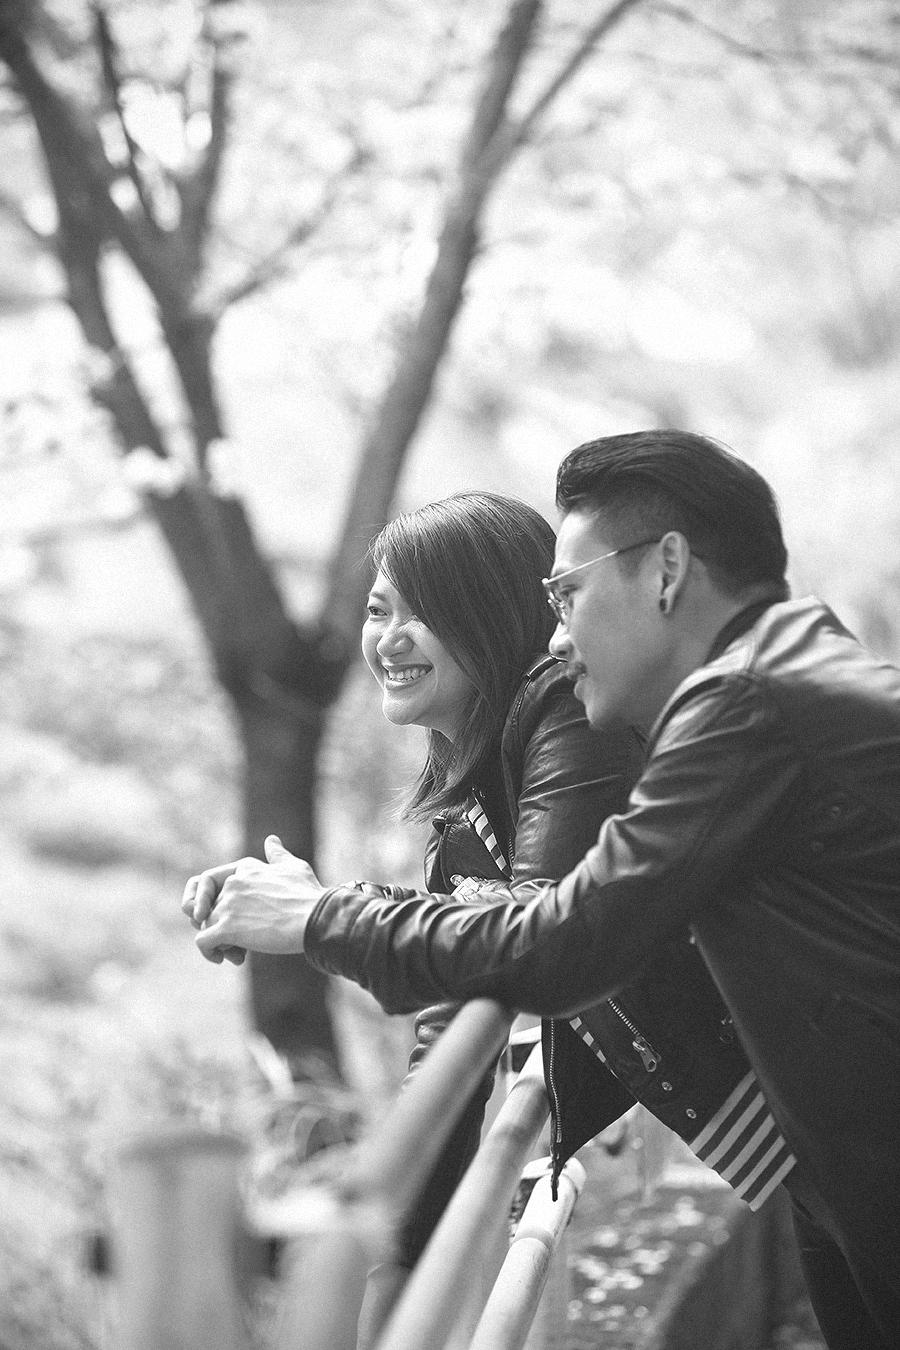 tokyo hakone japan spring sakura . engagement wedding photography by kurt ahs . ns + eu . 03641.jpg